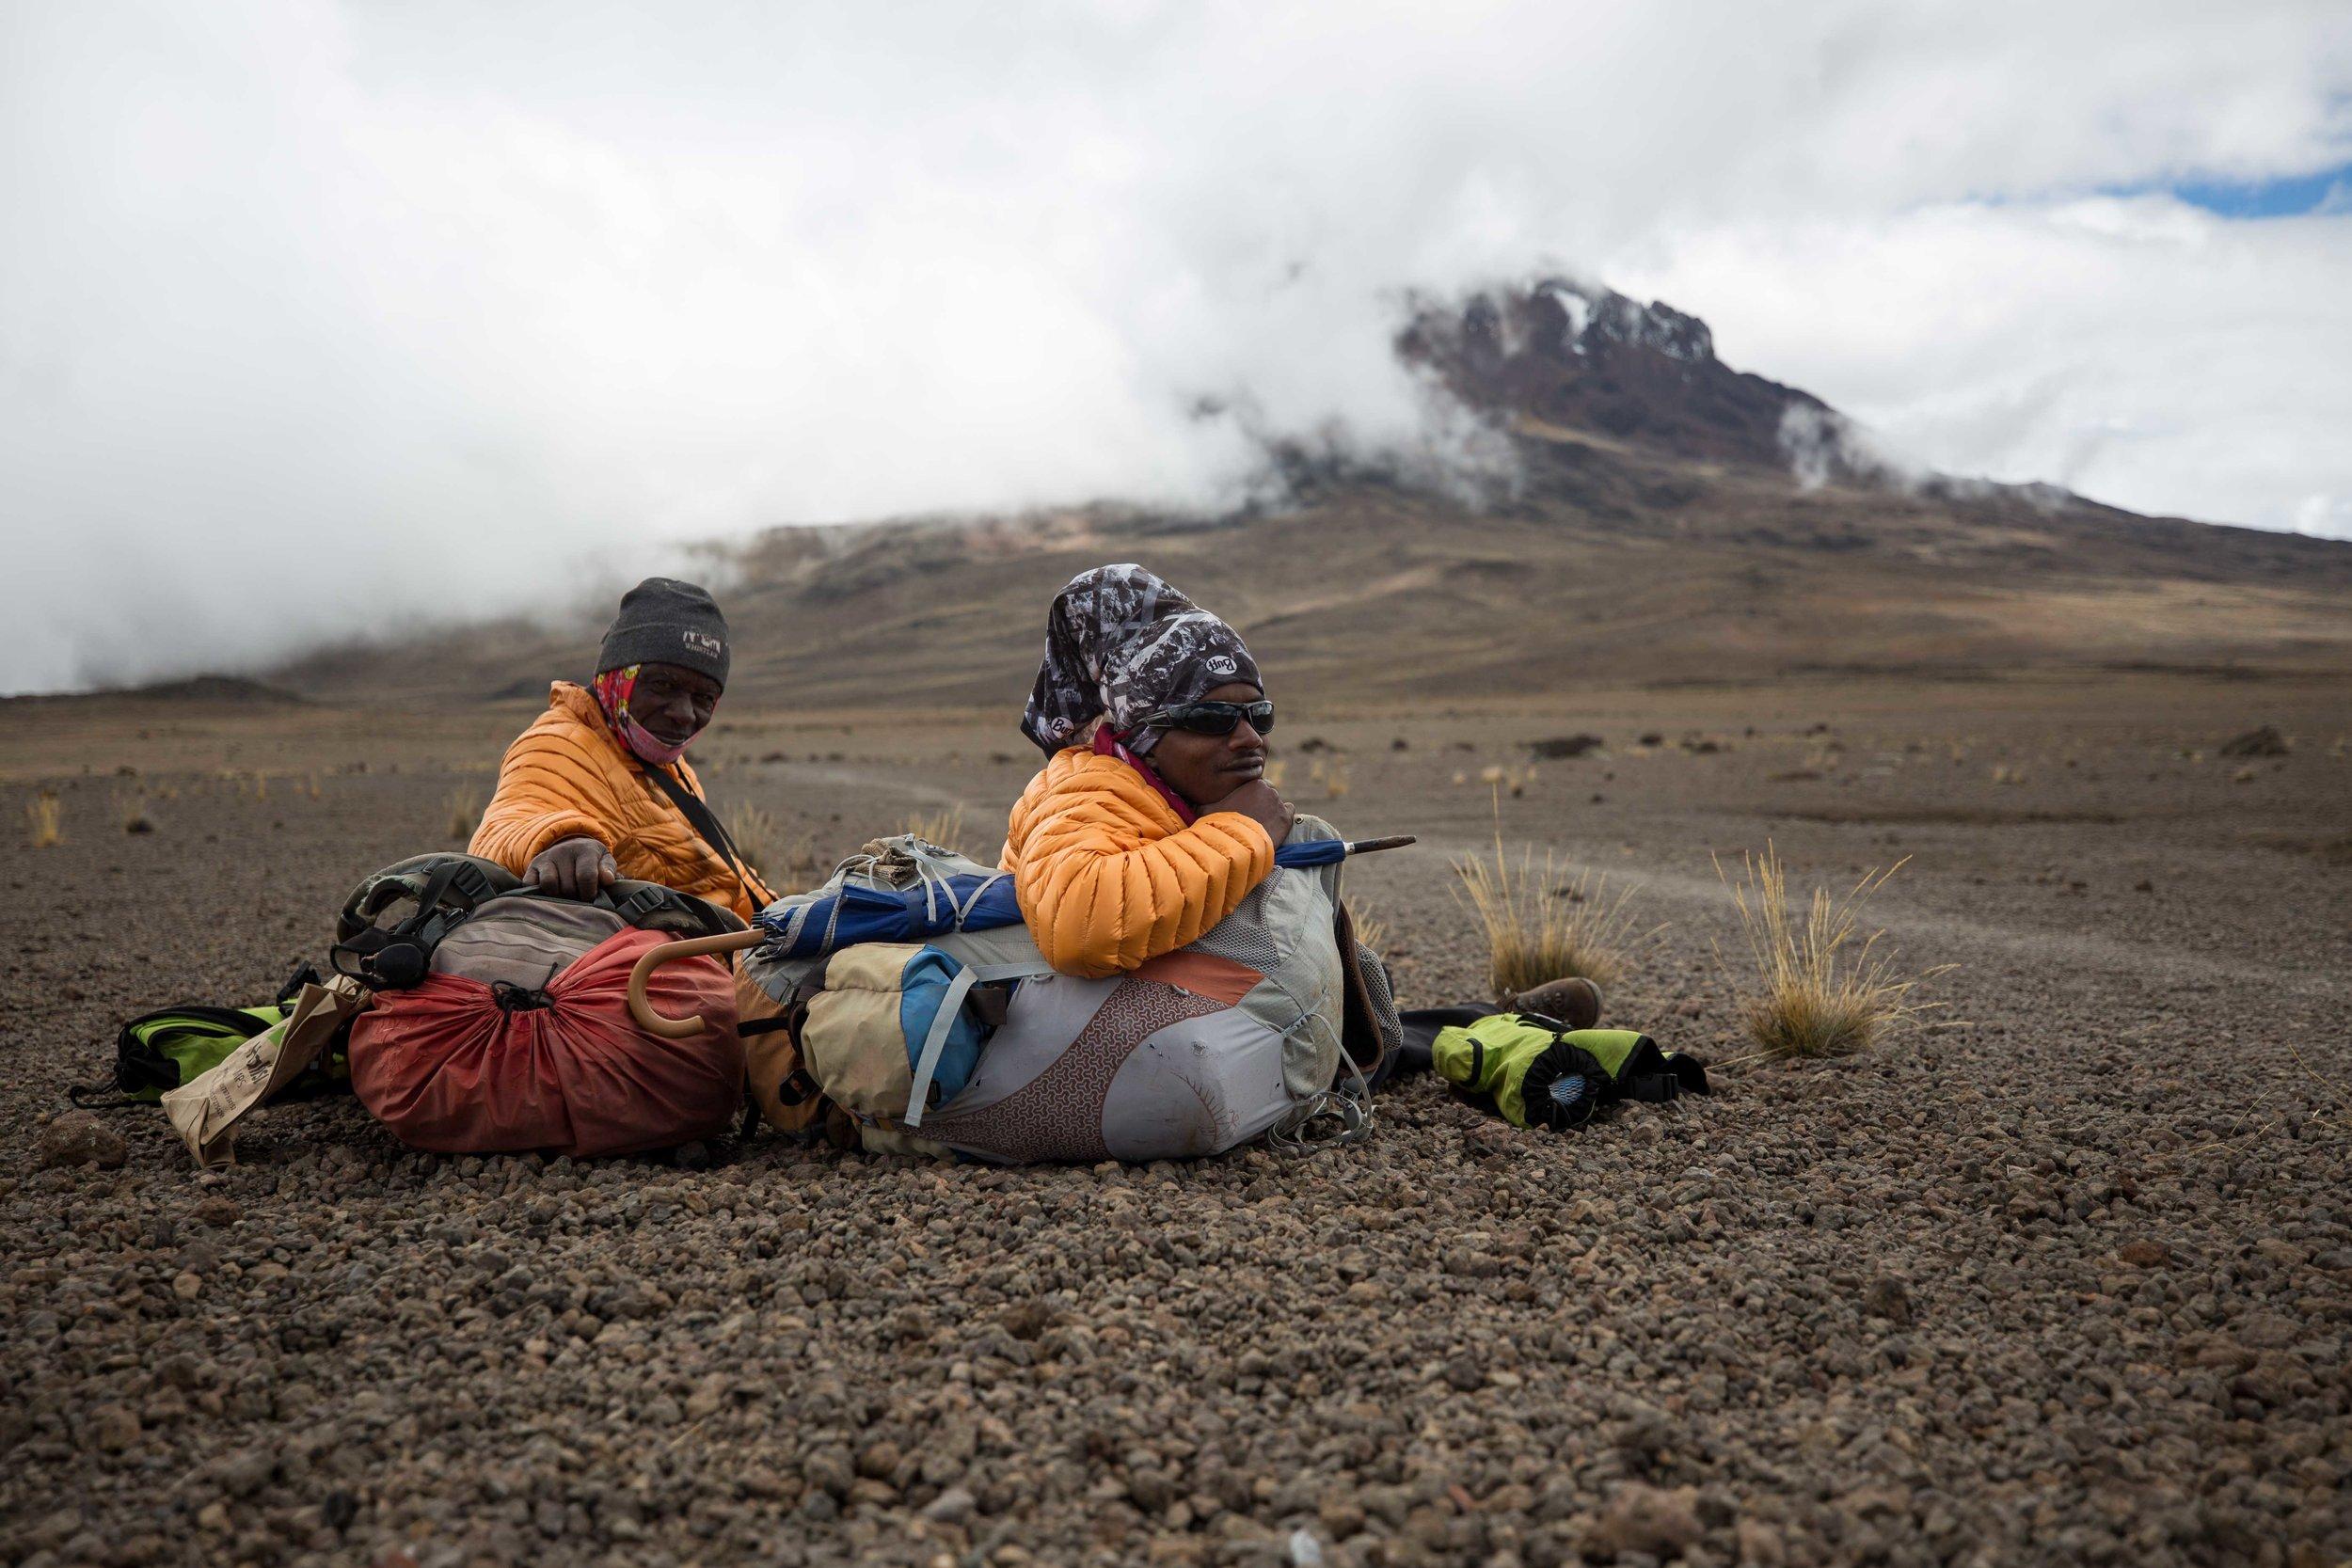 ajw_REI_Kilimanjaro-41.jpg